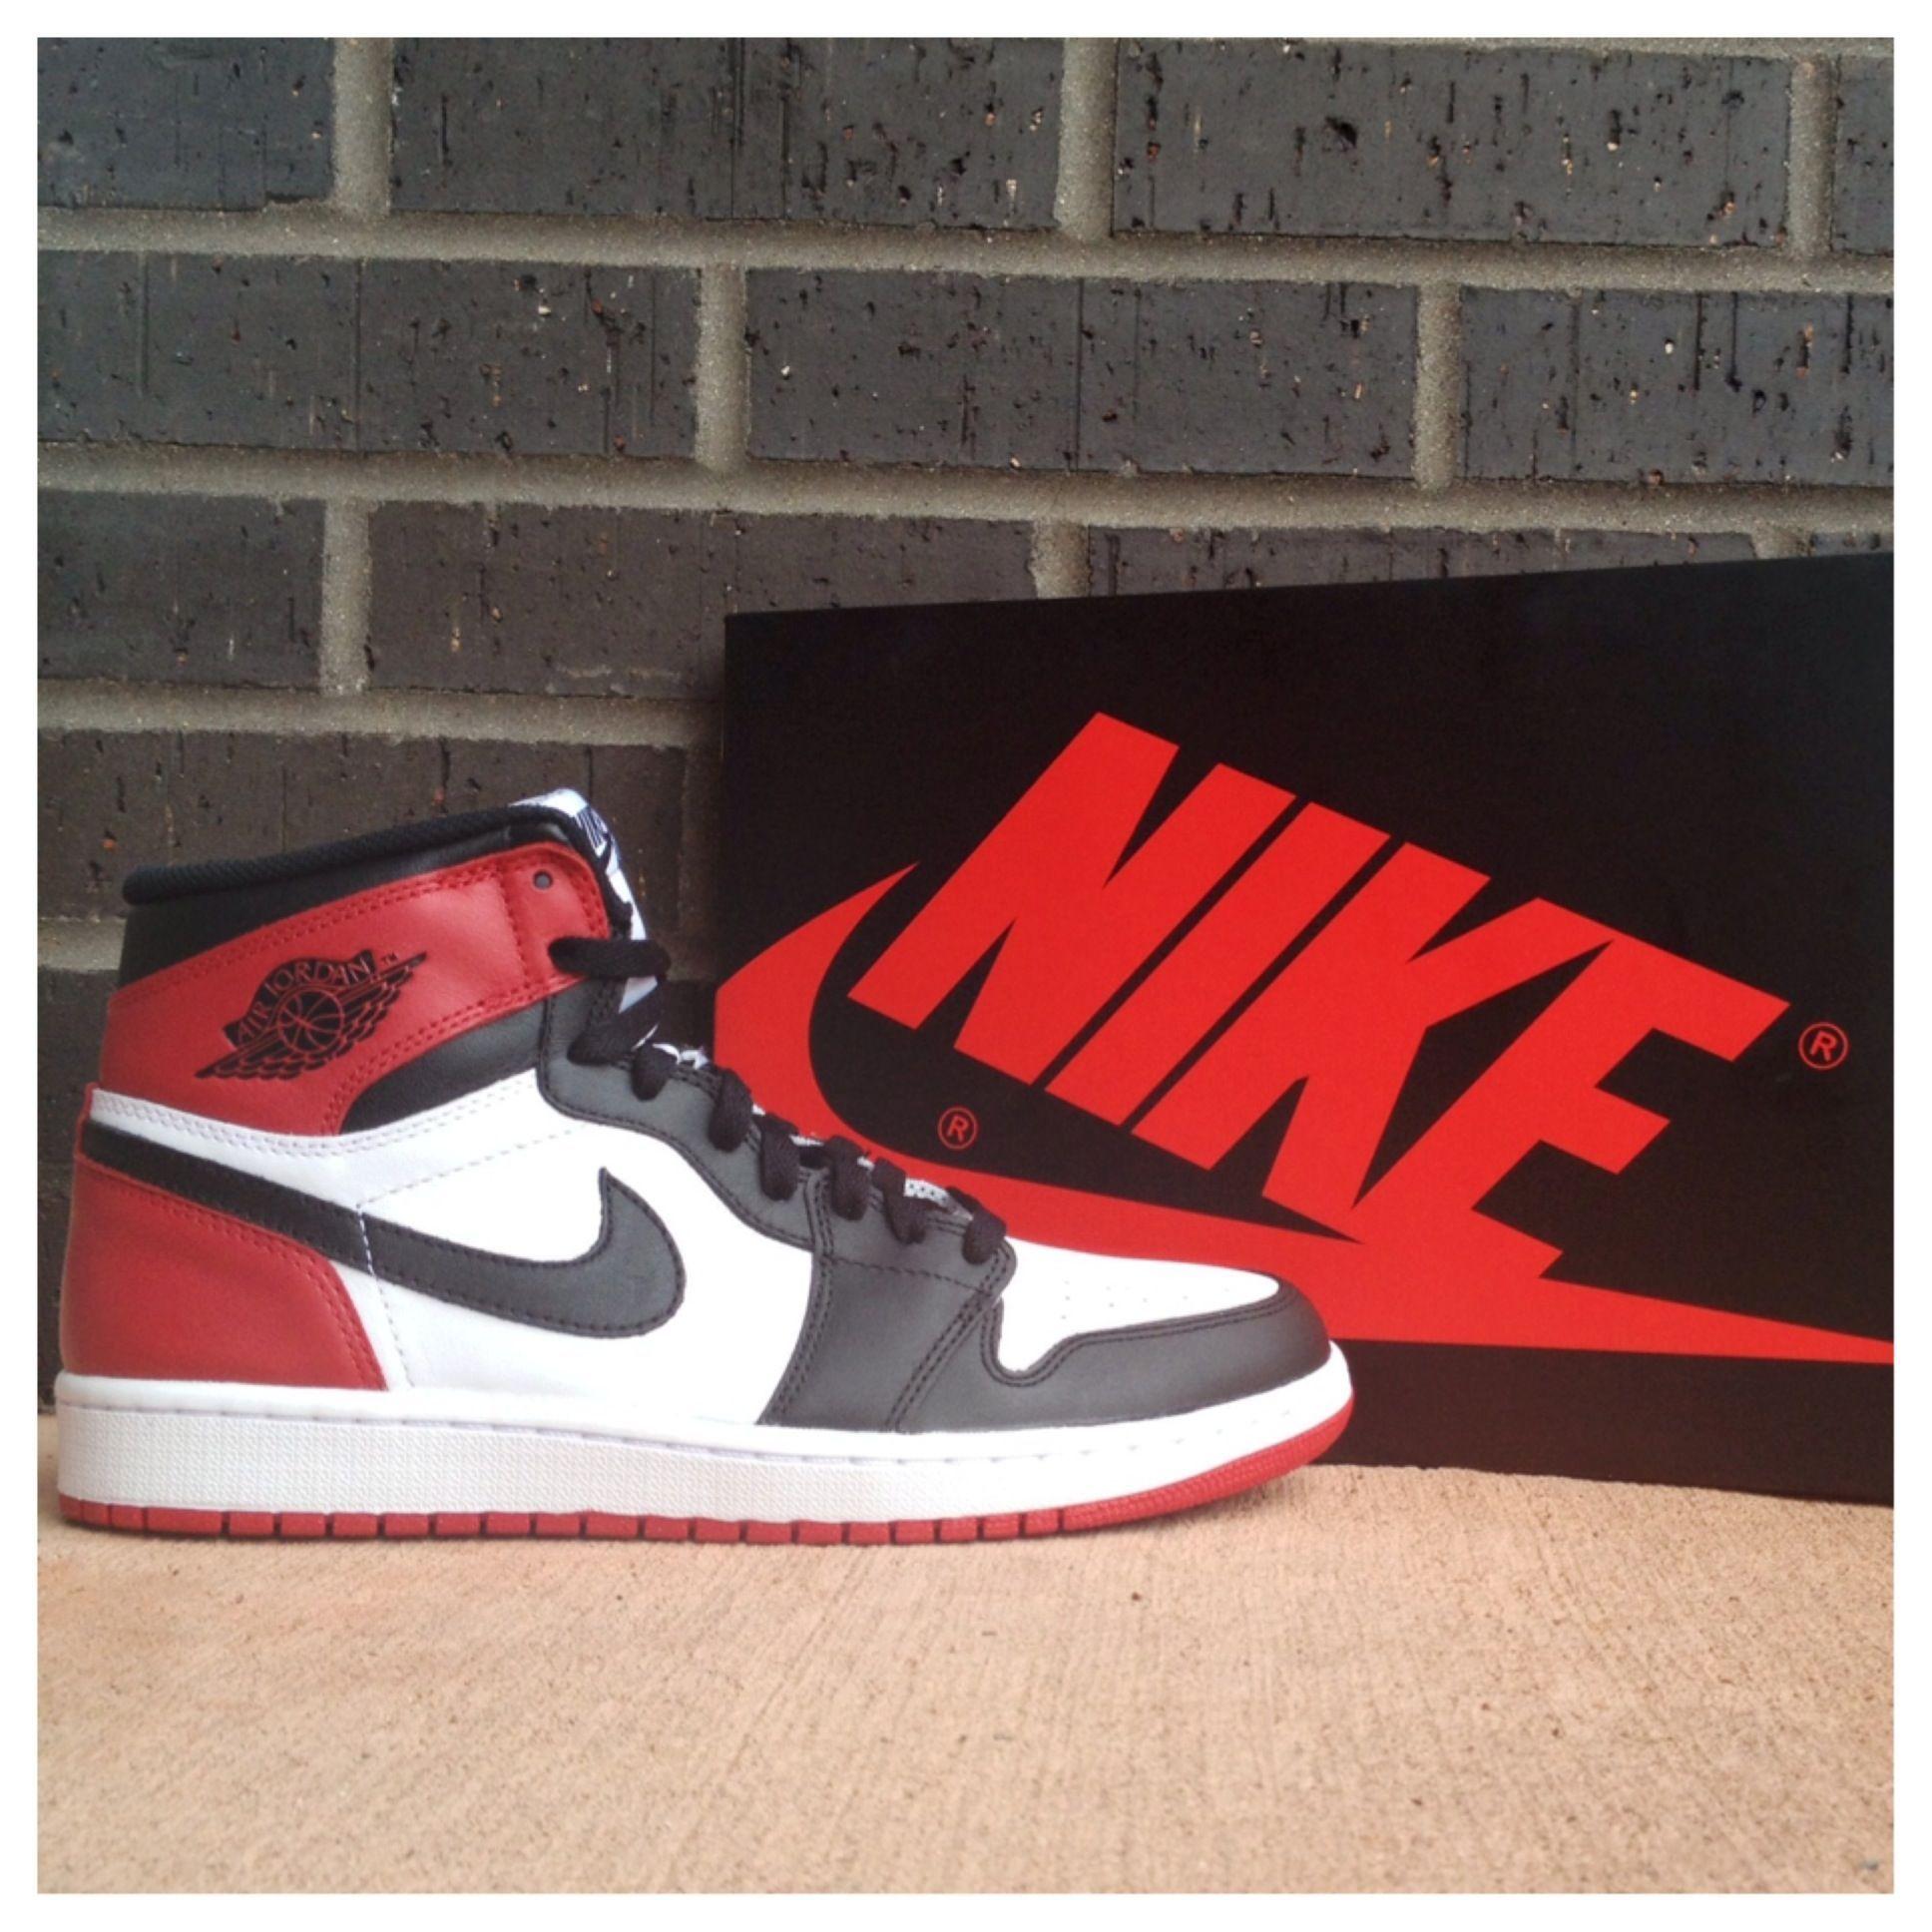 Jordan retro 1, Nike kicks, Newest jordans